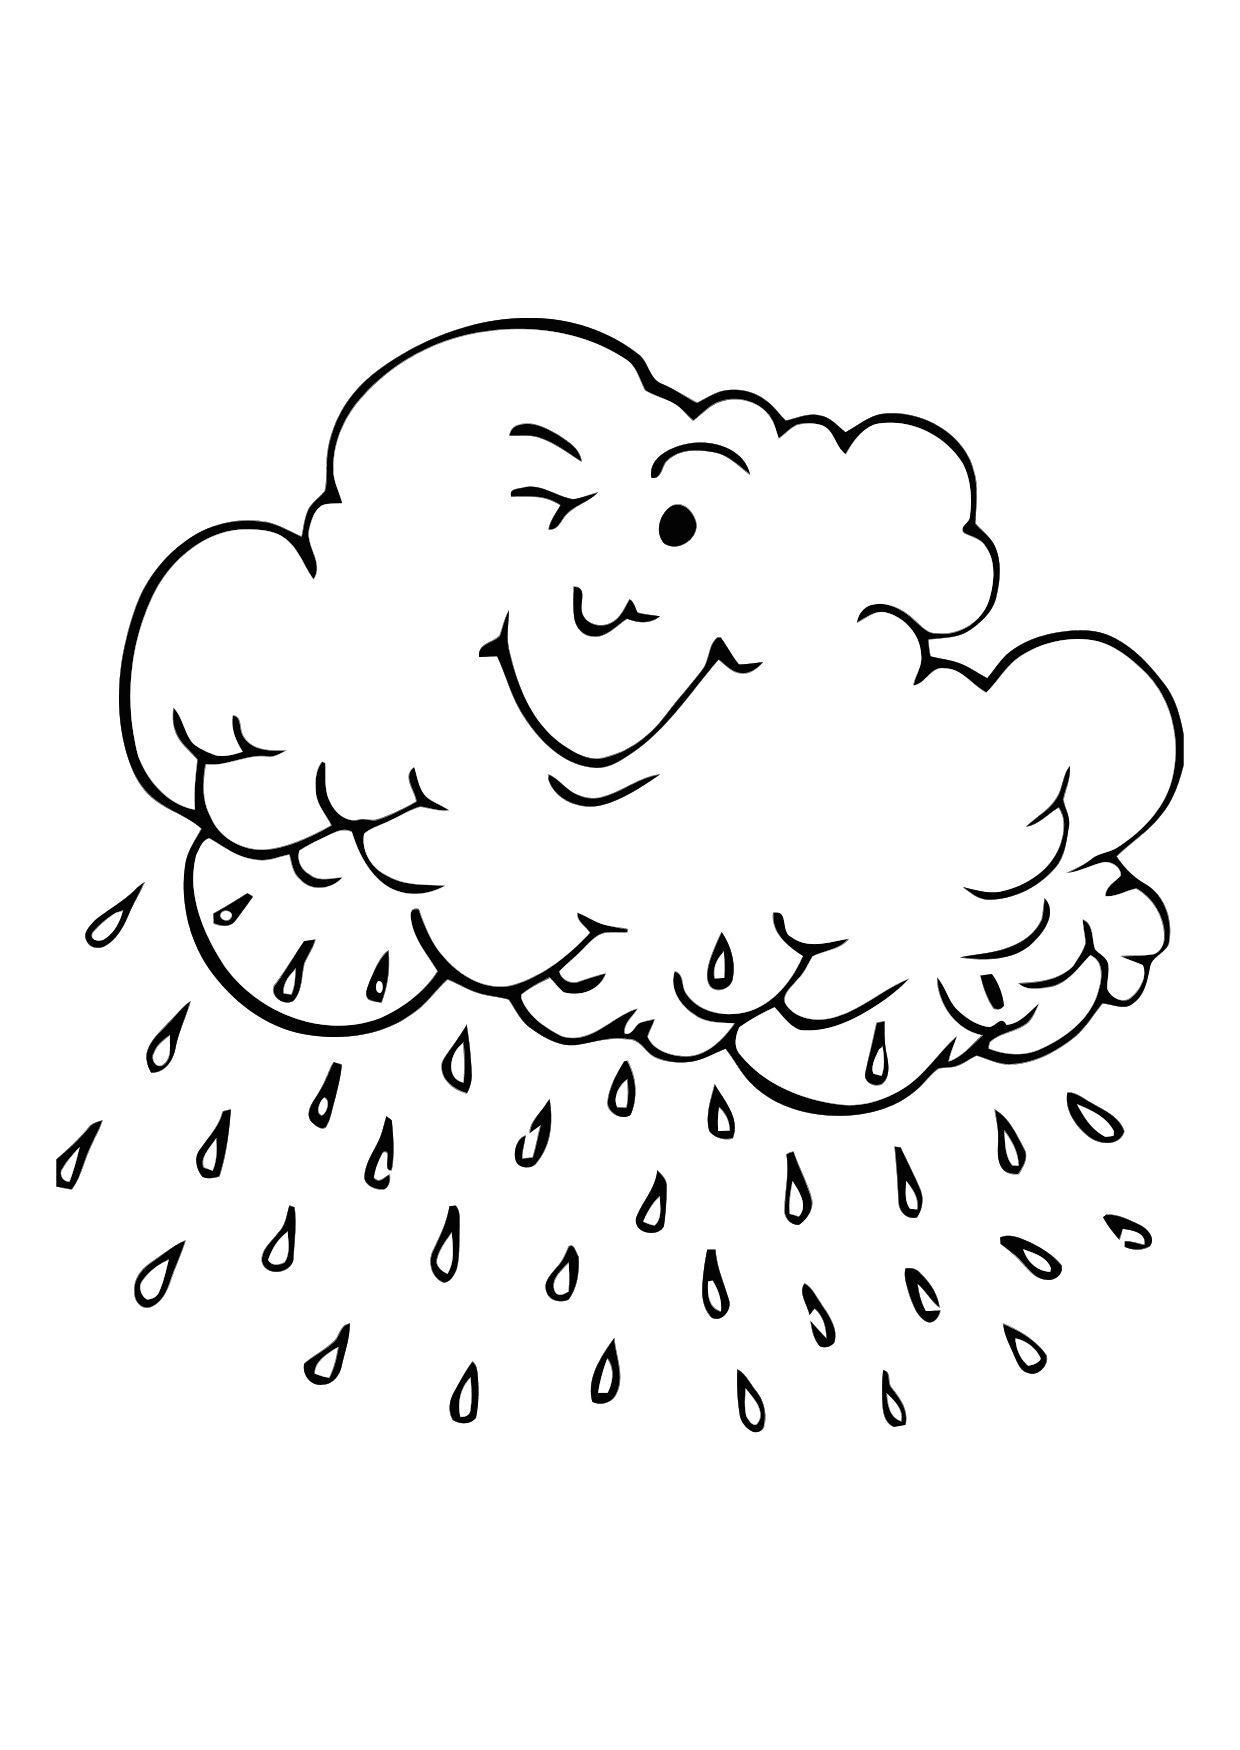 Dibujo para colorear Nube de lluvia - Img 11401